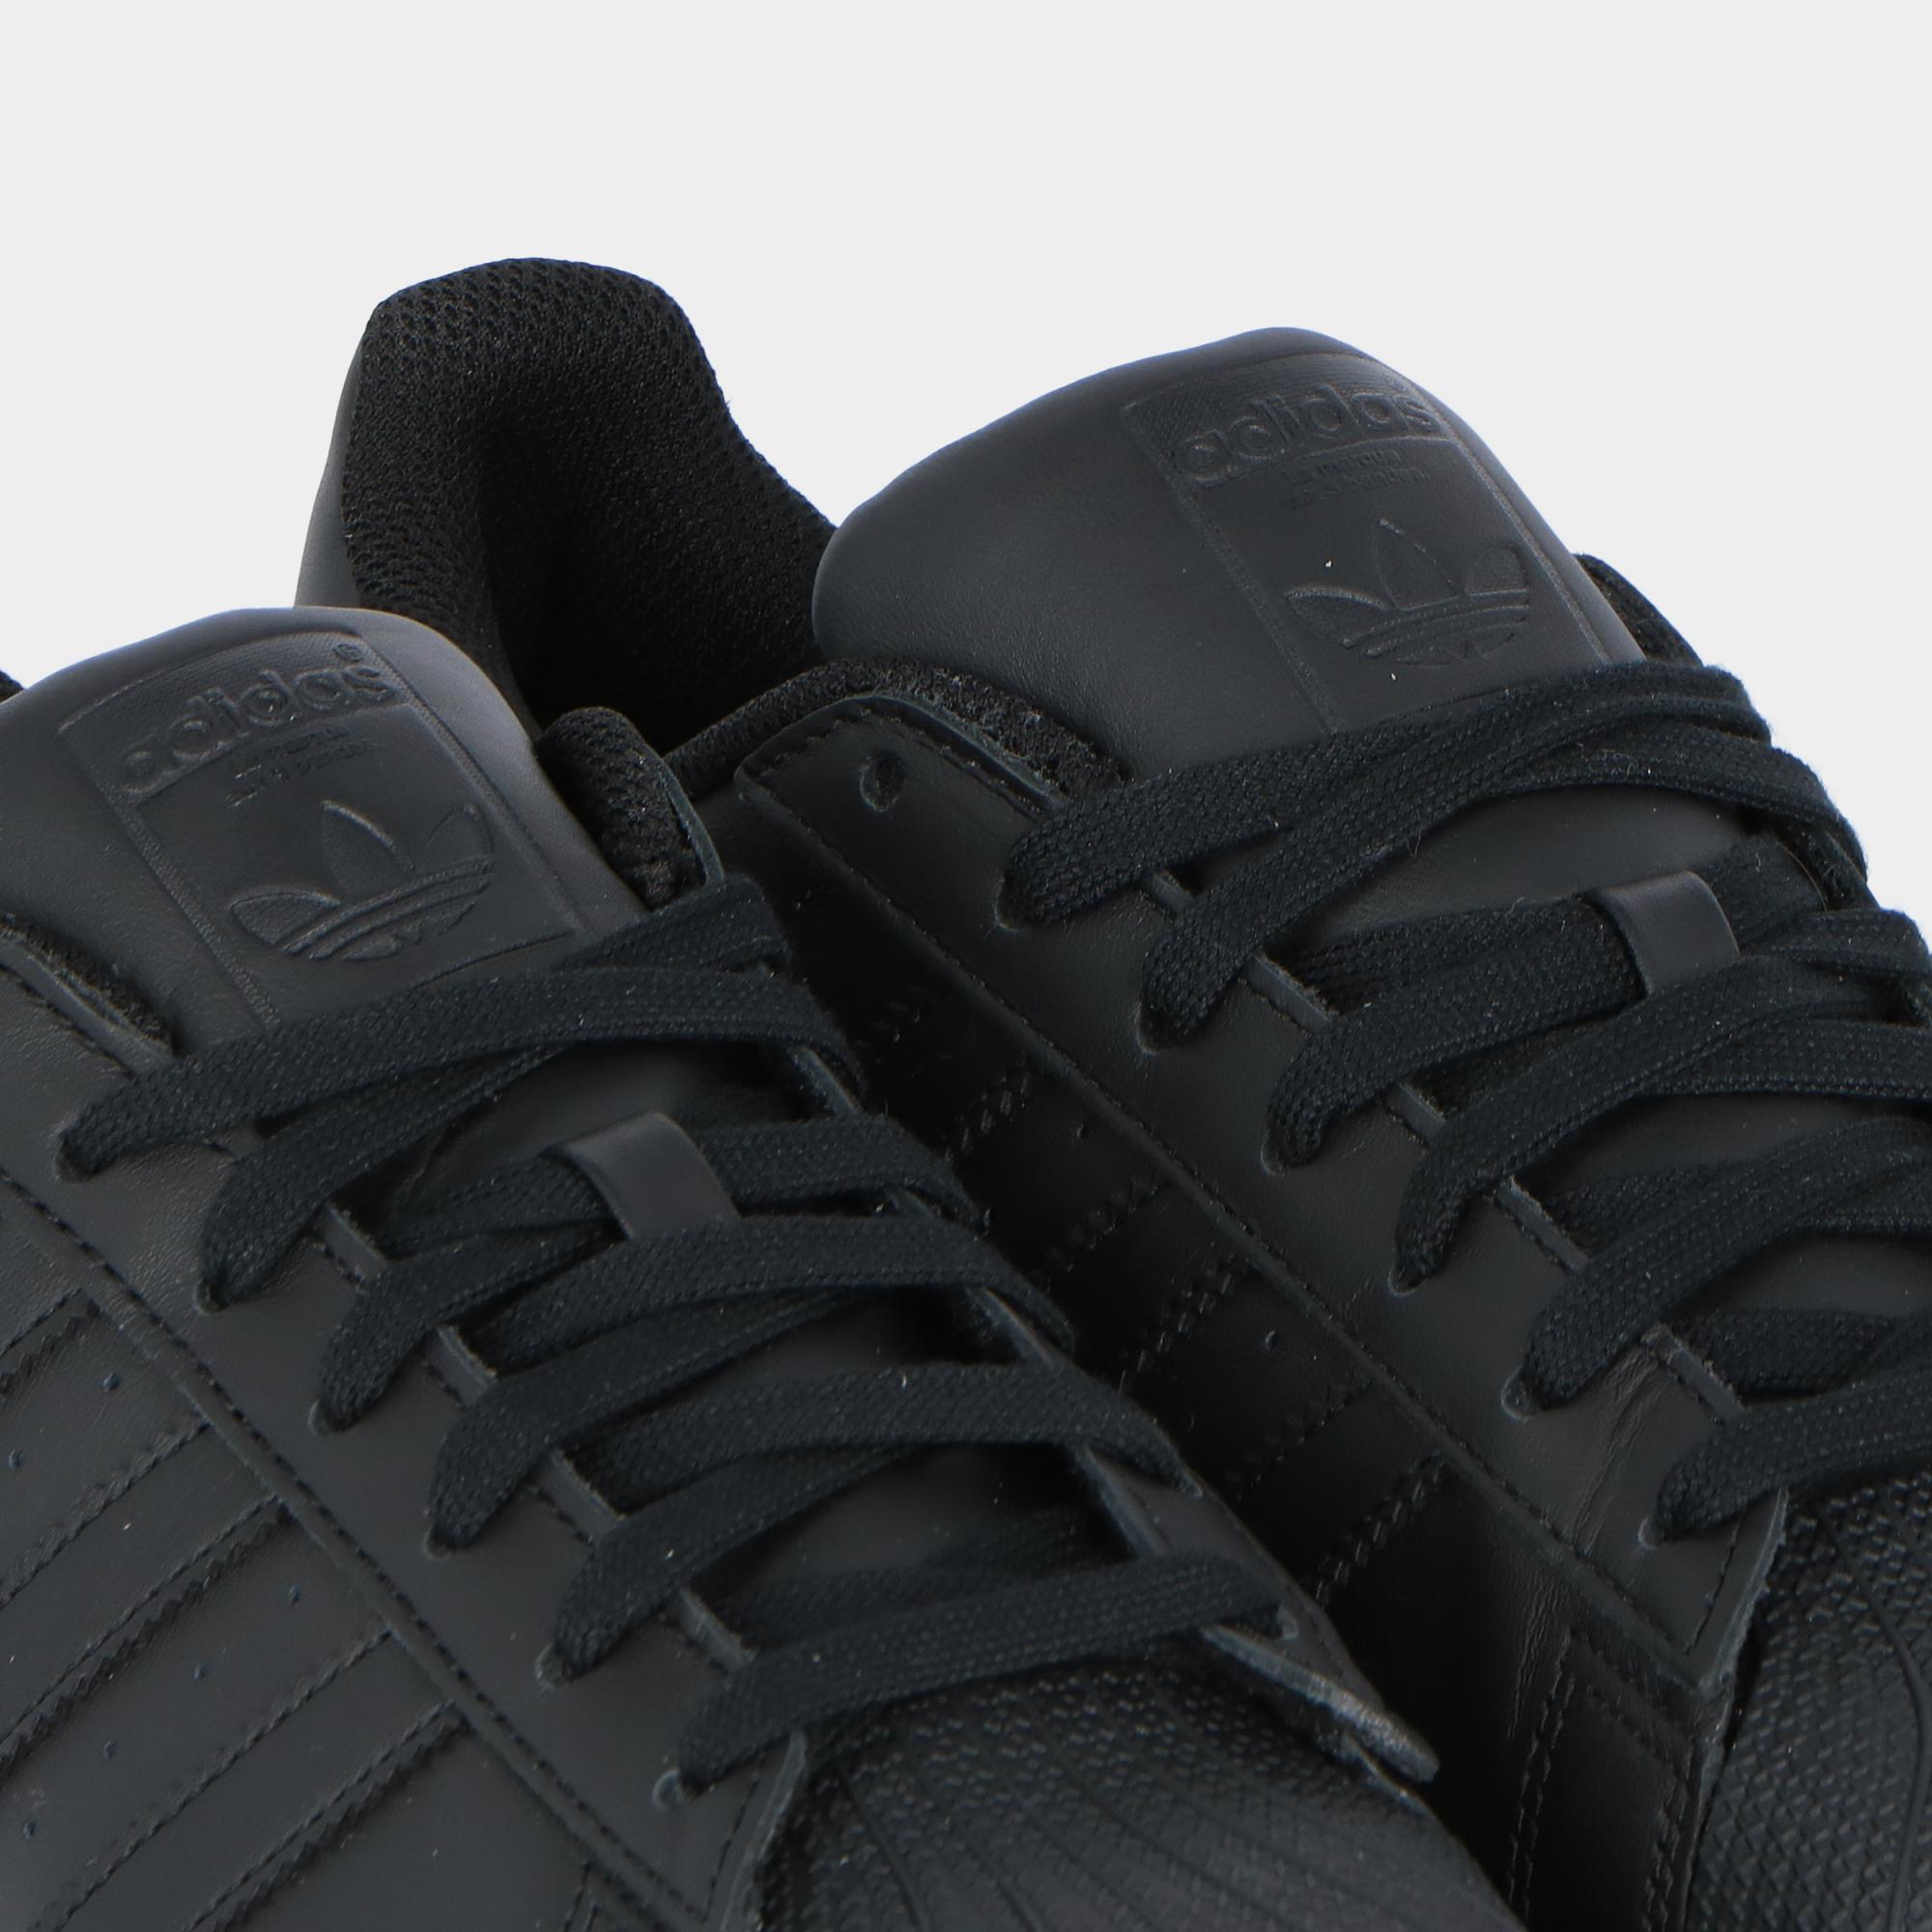 Adidas Superstar Black black